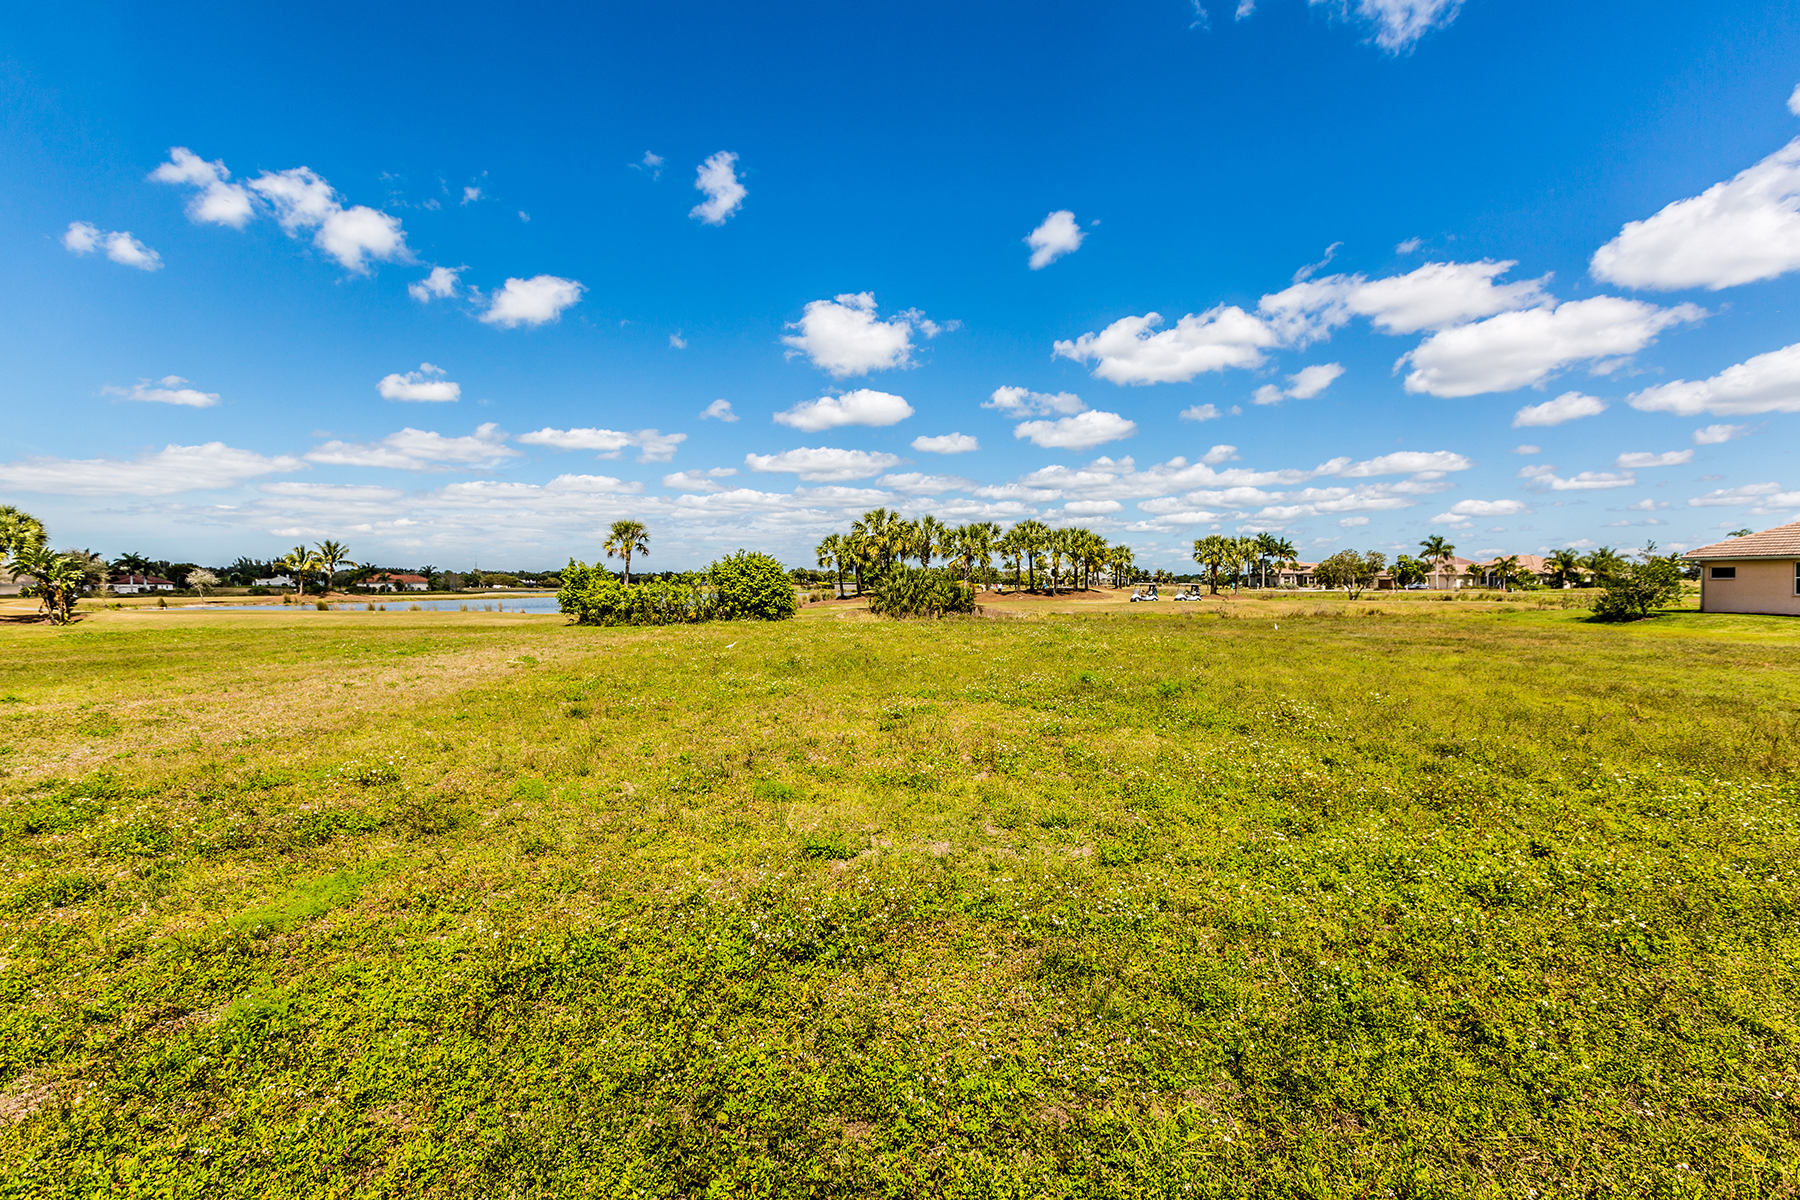 Terreno per Vendita alle ore NAPLES - ROYAL PALM GOLF ESTATES 18456 Royal Hammock Blvd Naples, Florida, 34114 Stati Uniti